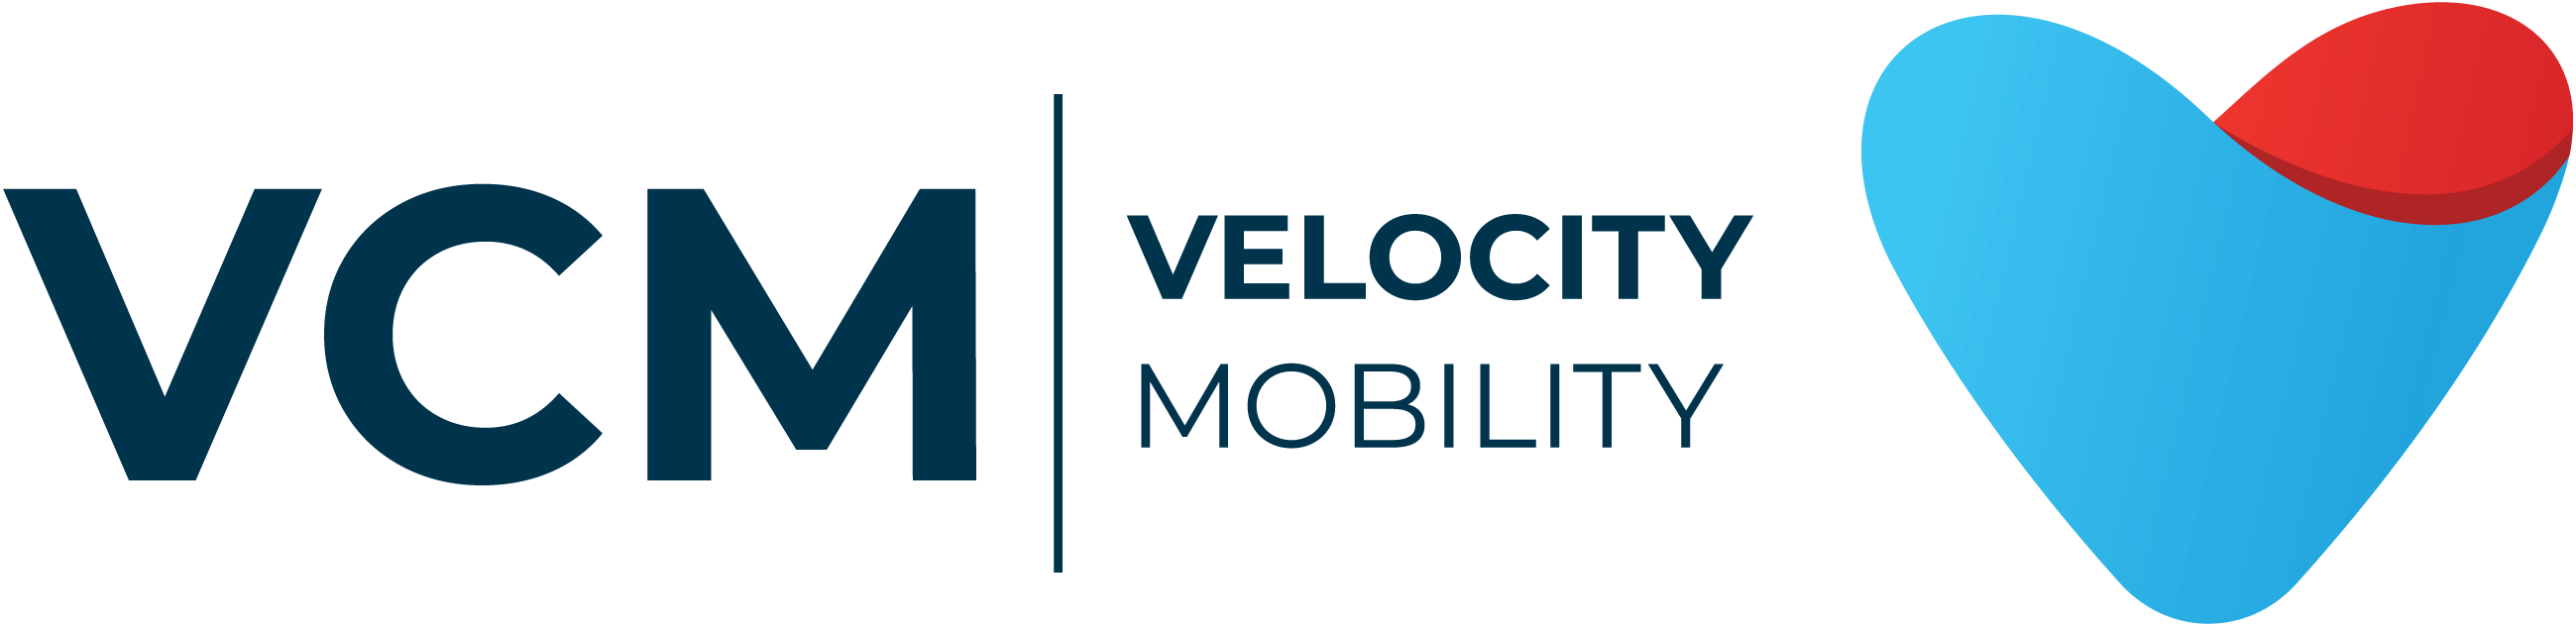 VCM_Logo_V2